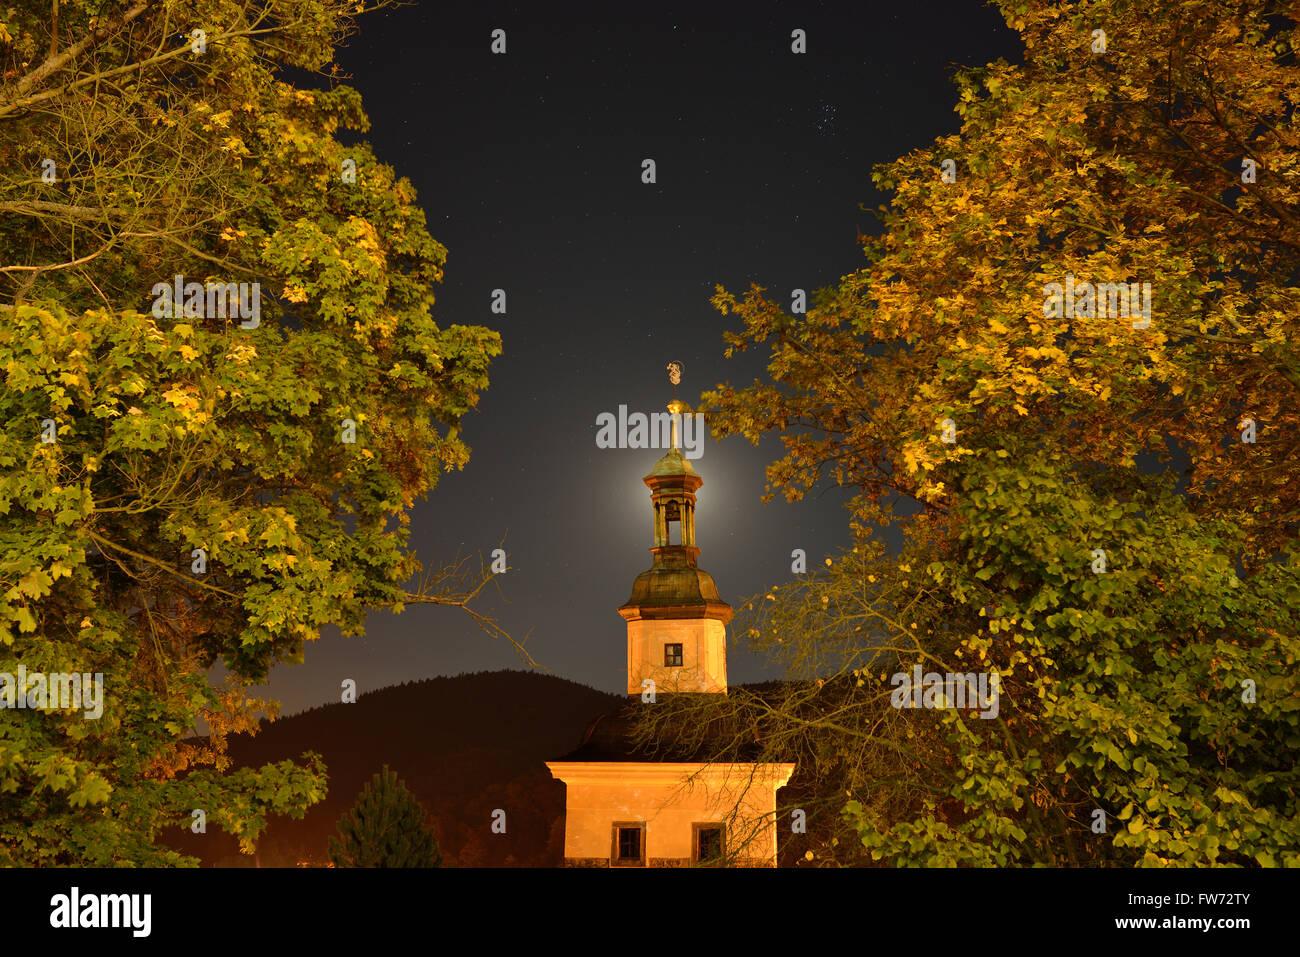 CHURCH AND FOLIAGE ILLUMINATED BY STREET LIGHTS WITH MOON BEHIND STEEPLE. Loket, Bohemia, Czech Republic. - Stock Image